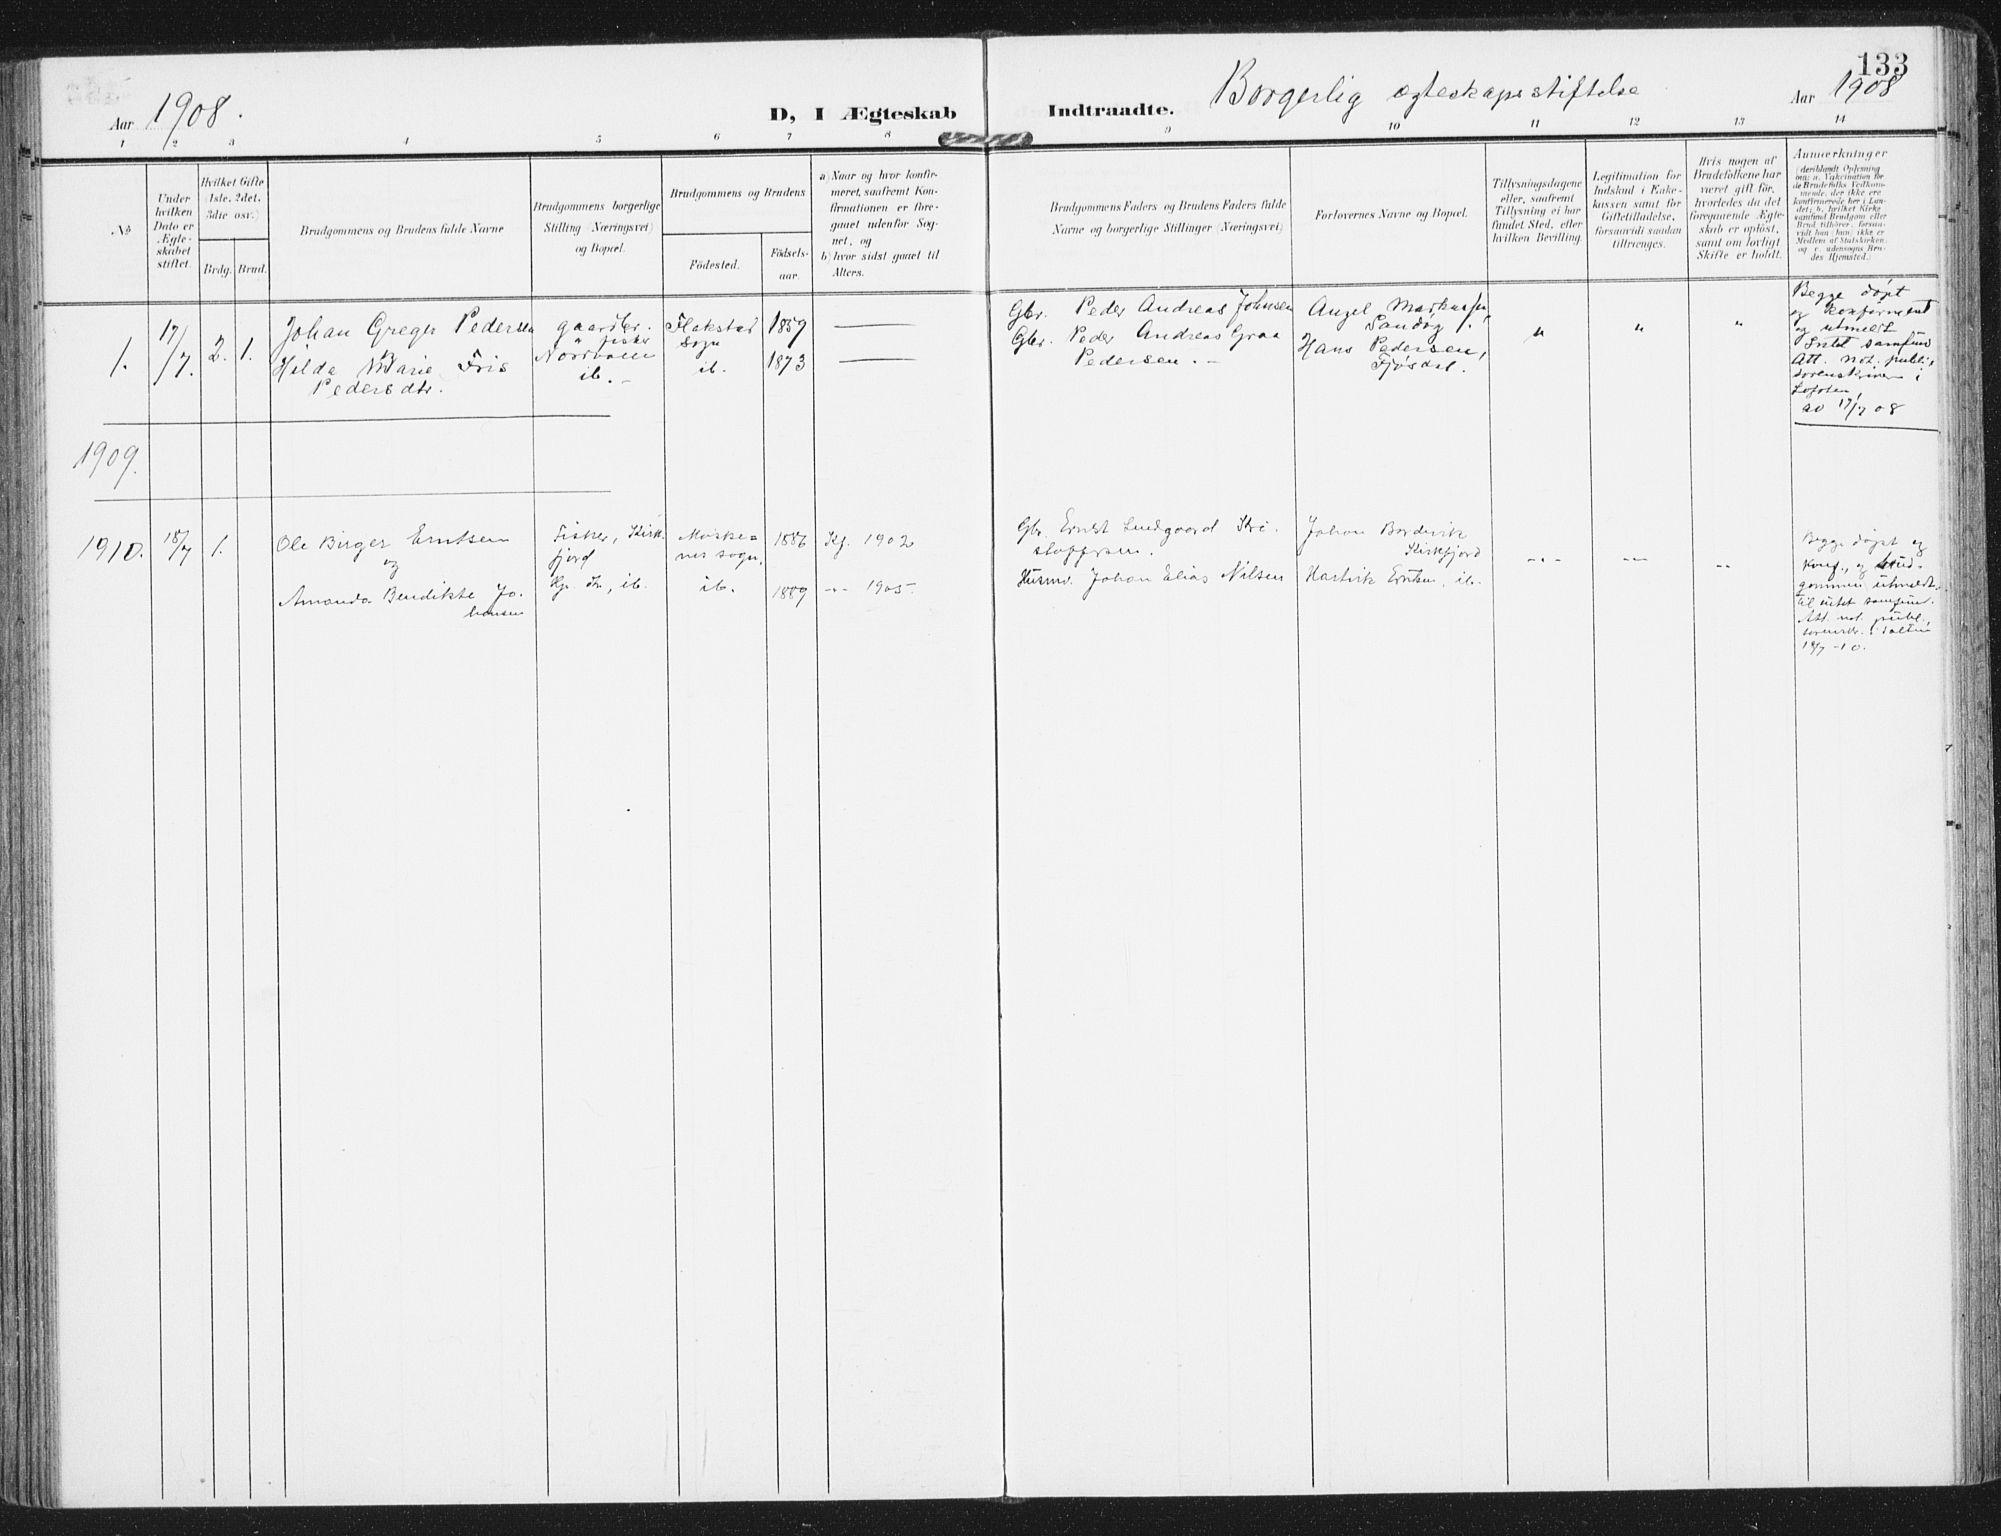 SAT, Ministerialprotokoller, klokkerbøker og fødselsregistre - Nordland, 885/L1206: Ministerialbok nr. 885A07, 1905-1915, s. 133